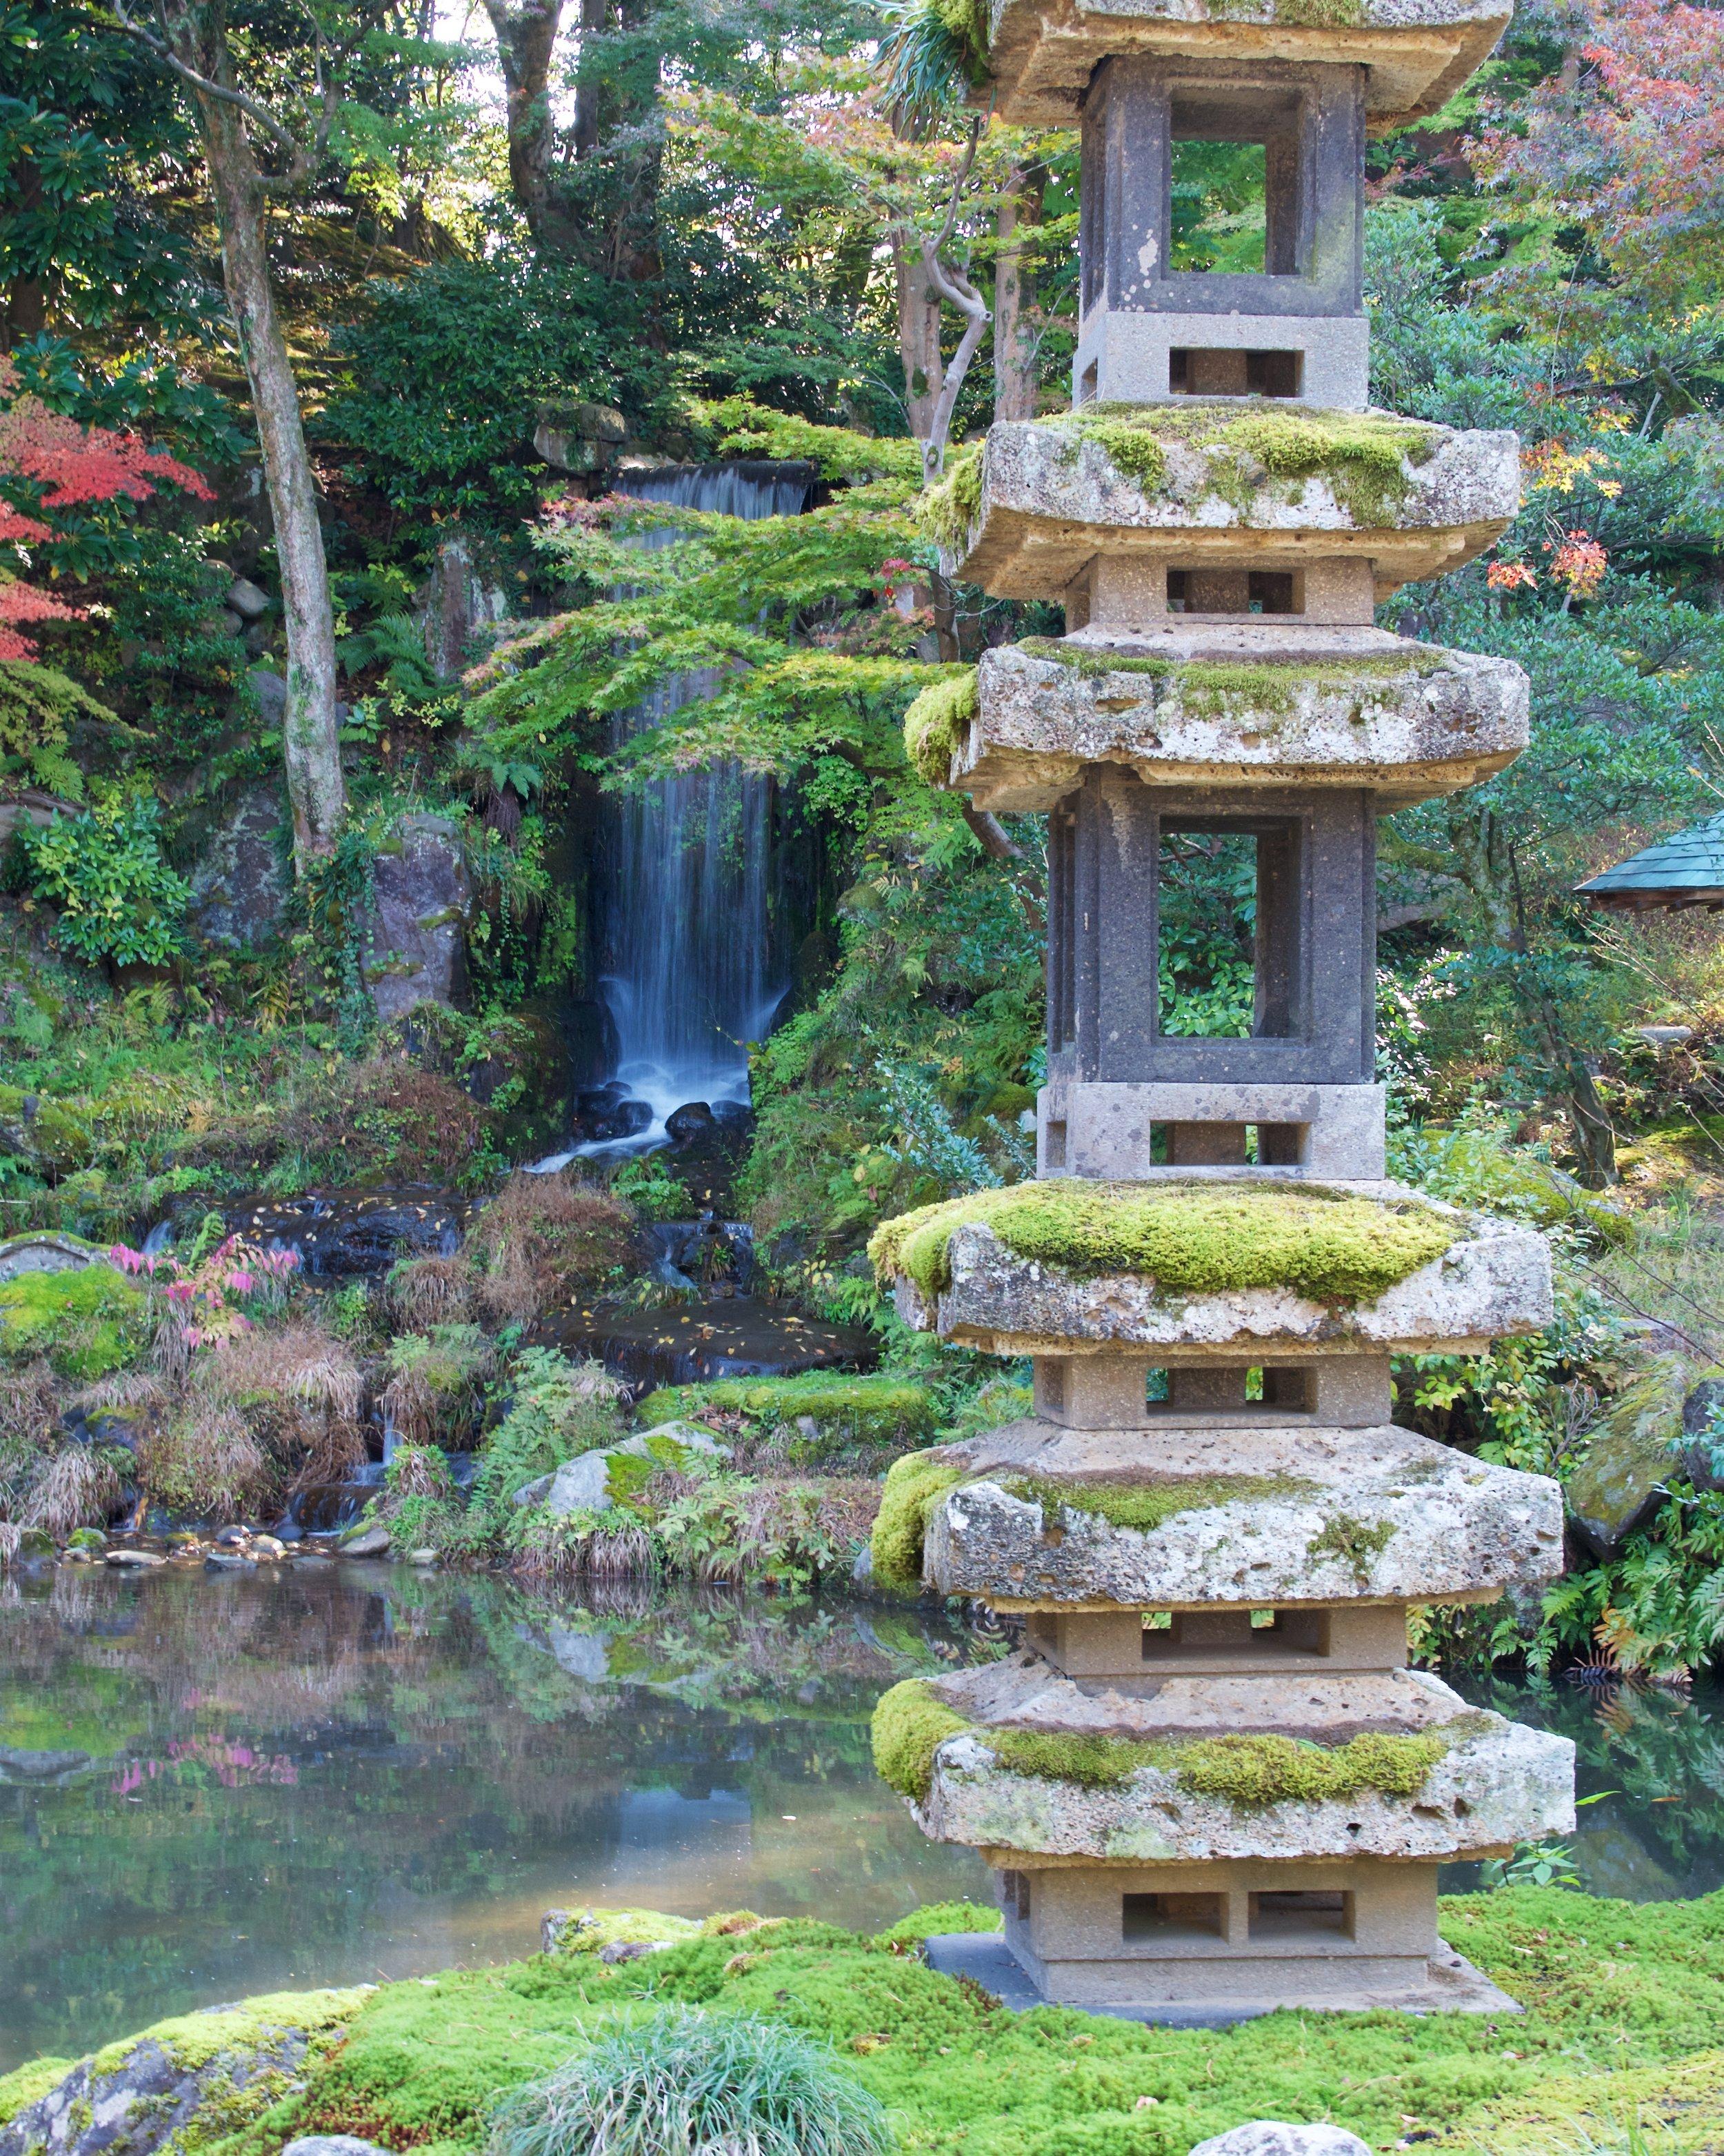 Kaisekito Pagoda, Midoritaki Waterfall